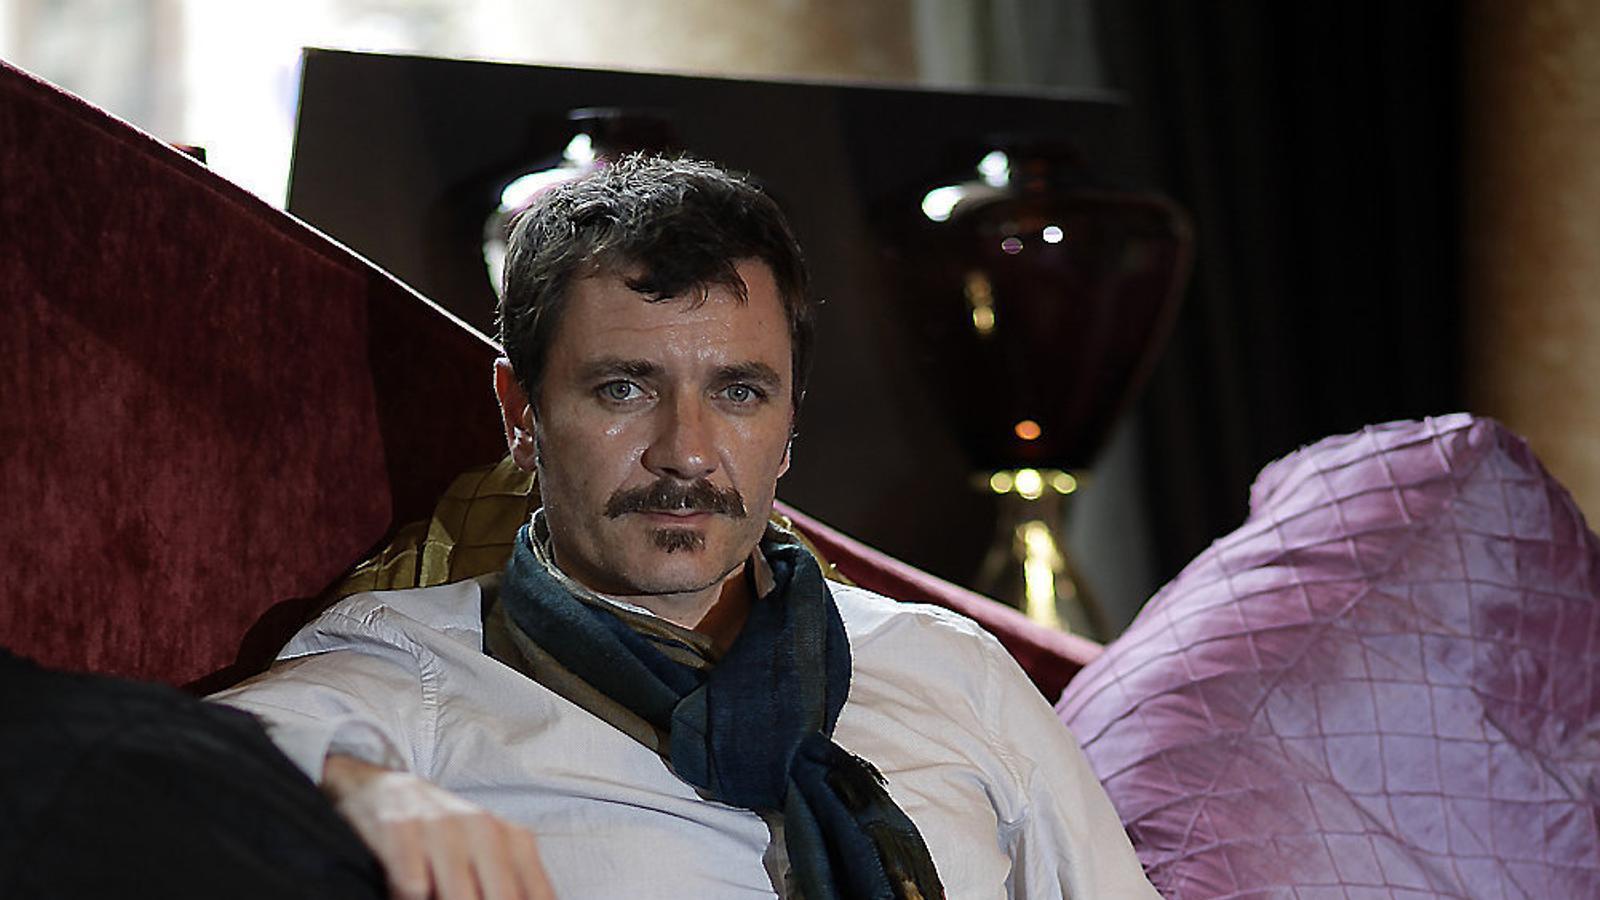 Àlex Brendemühl, l'èxit discret d'un actor sense fronteres